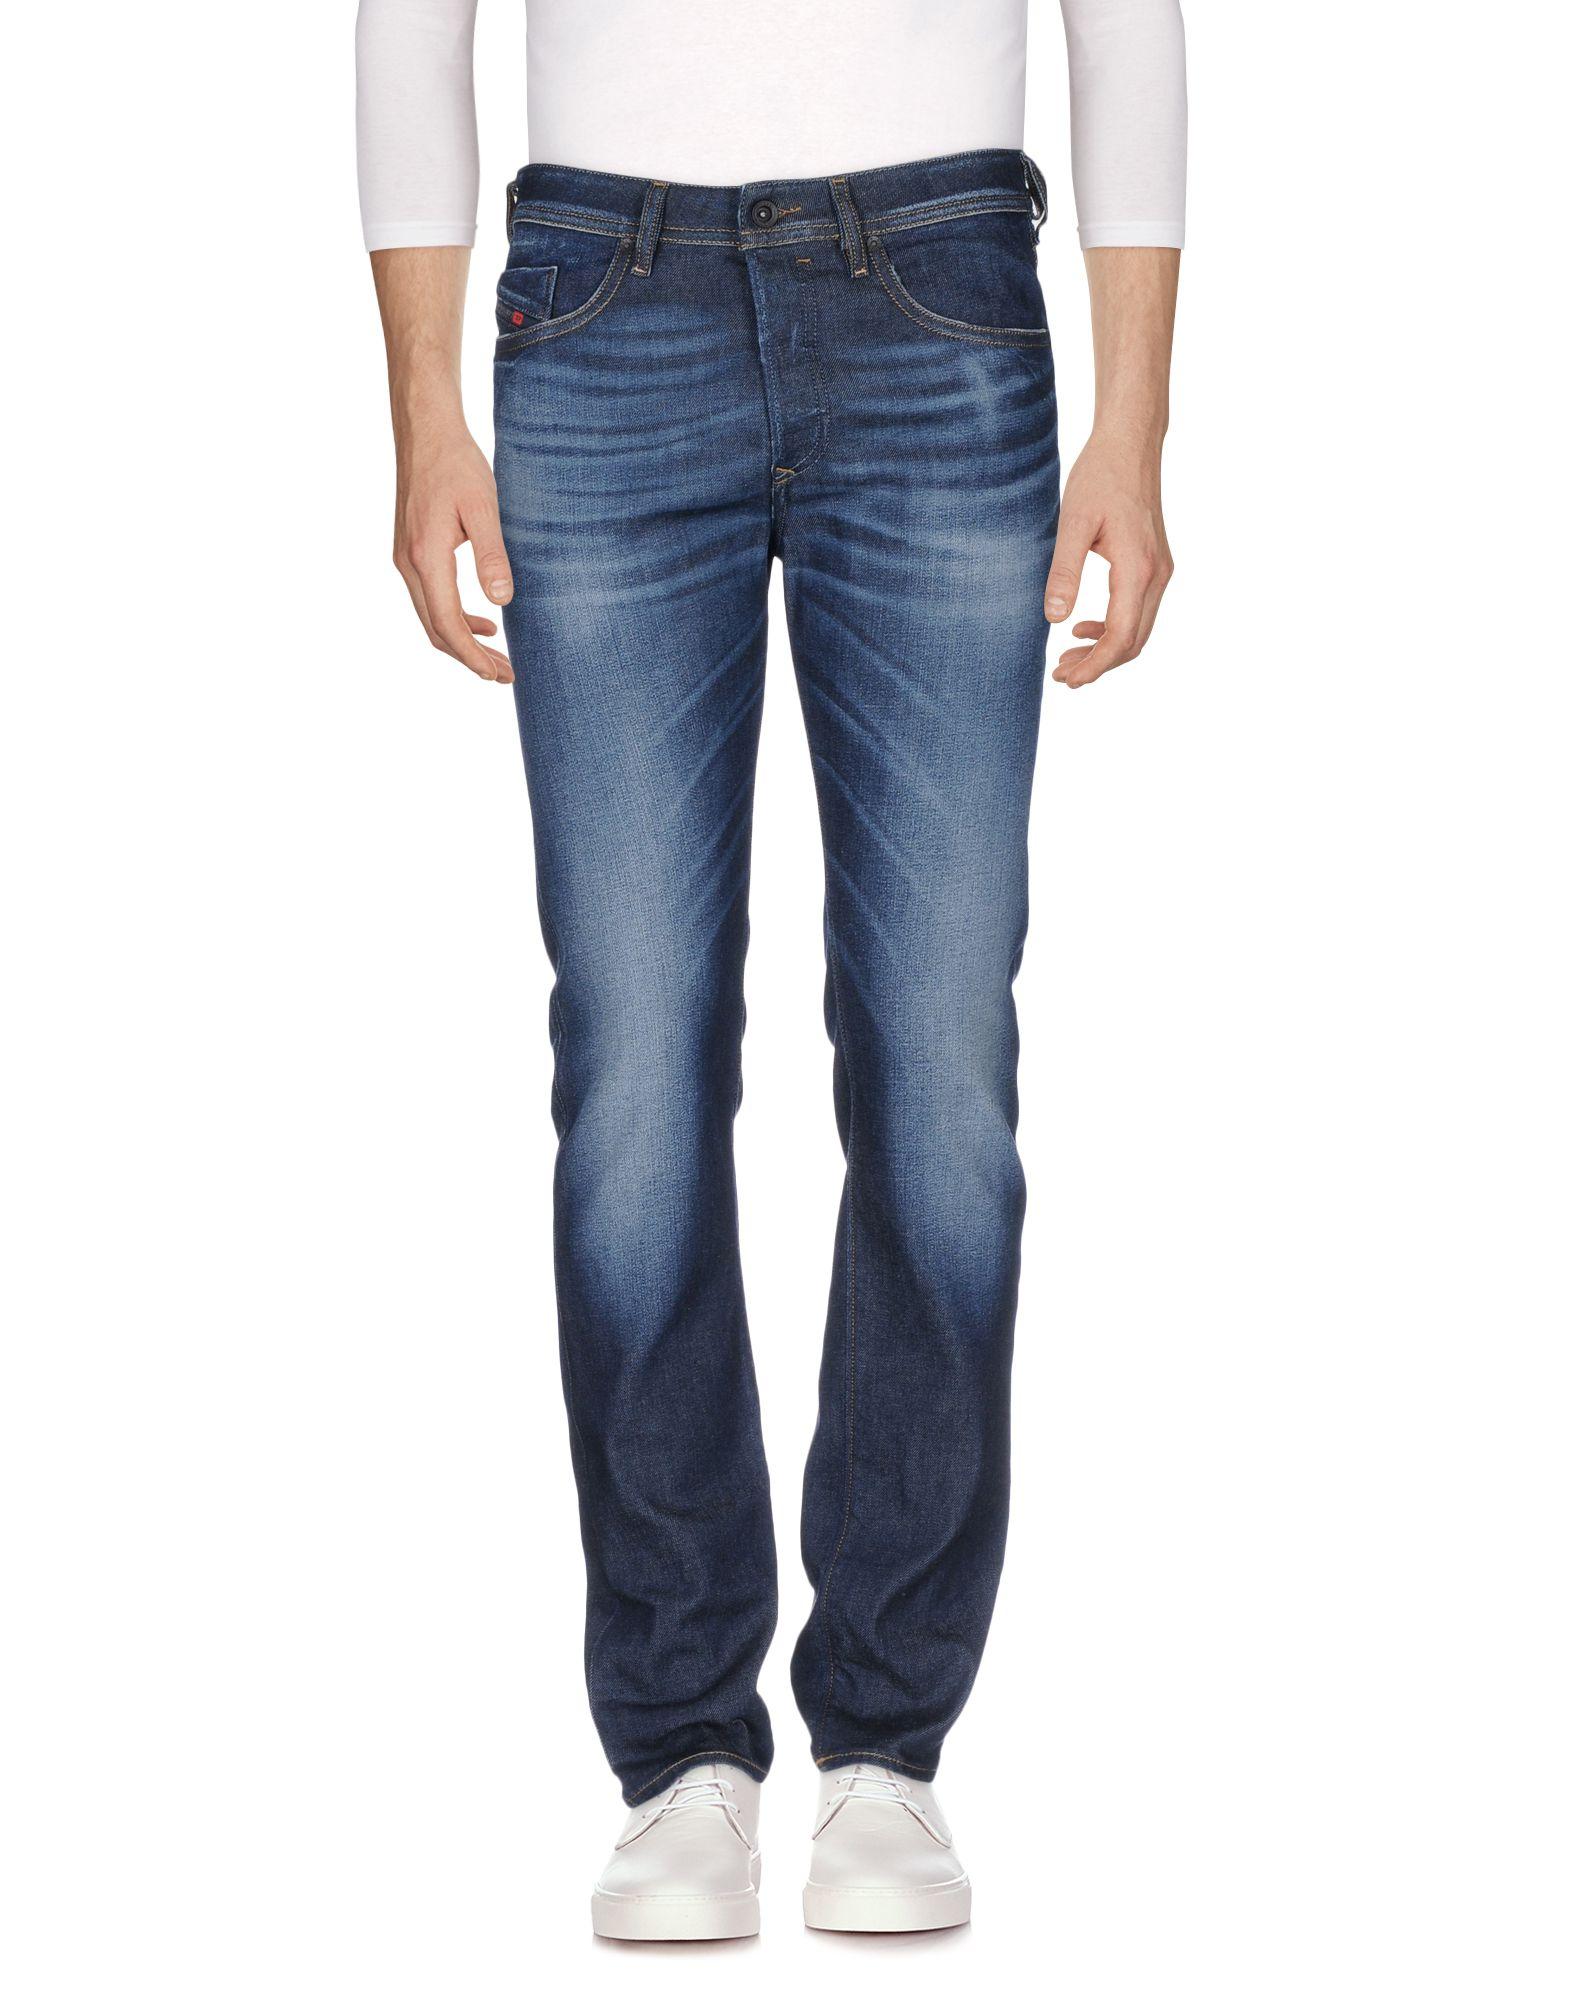 Pantaloni Jeans Diesel Uomo - Acquista online su